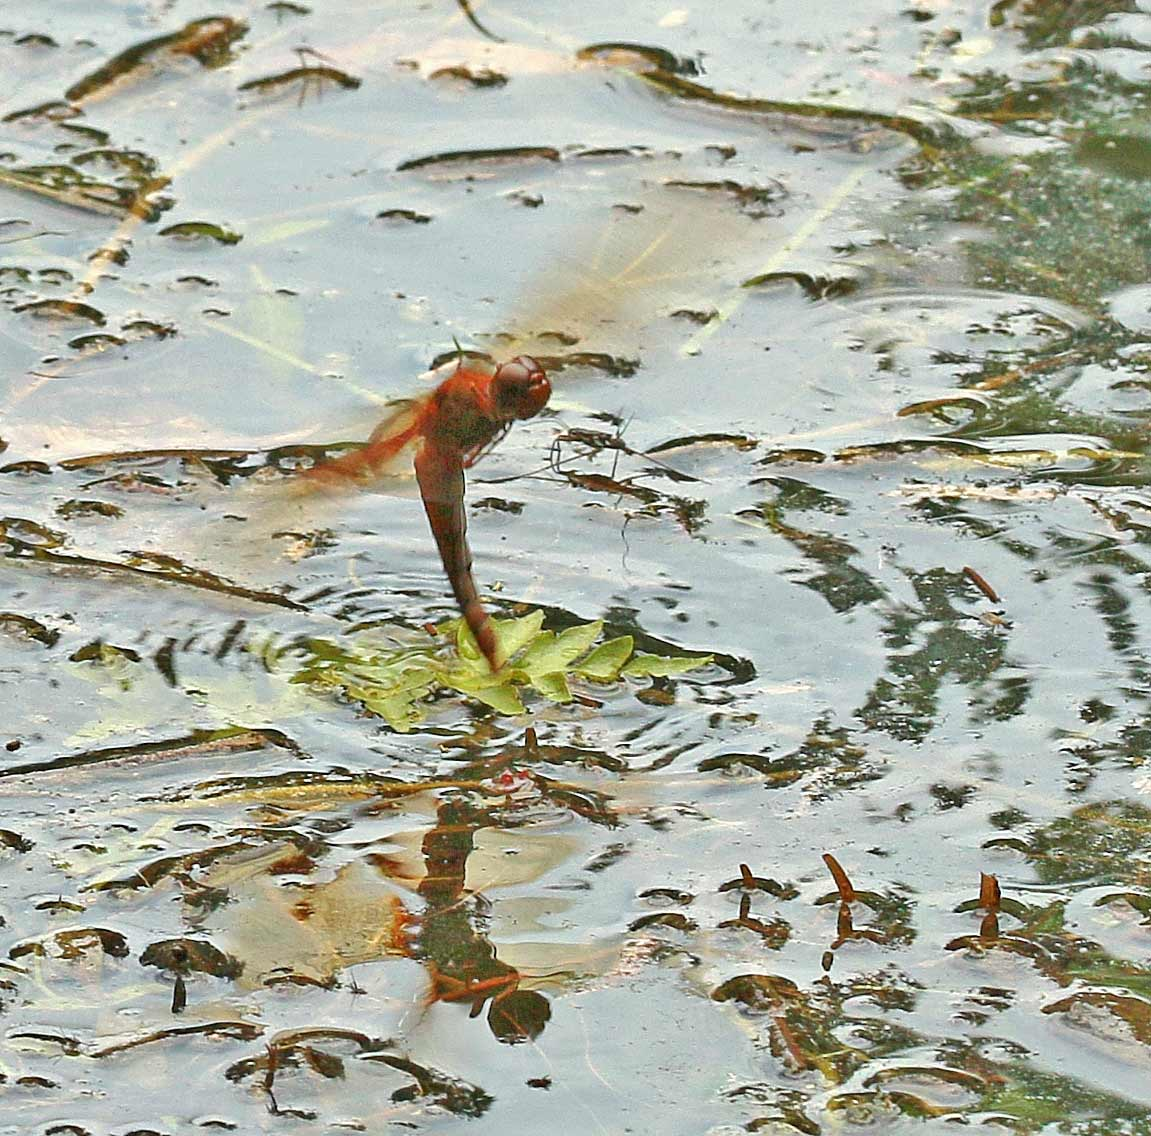 Tramea trnasmarina femelle en ponte, Vietnam, Cuc Phong, 14 juin 2018